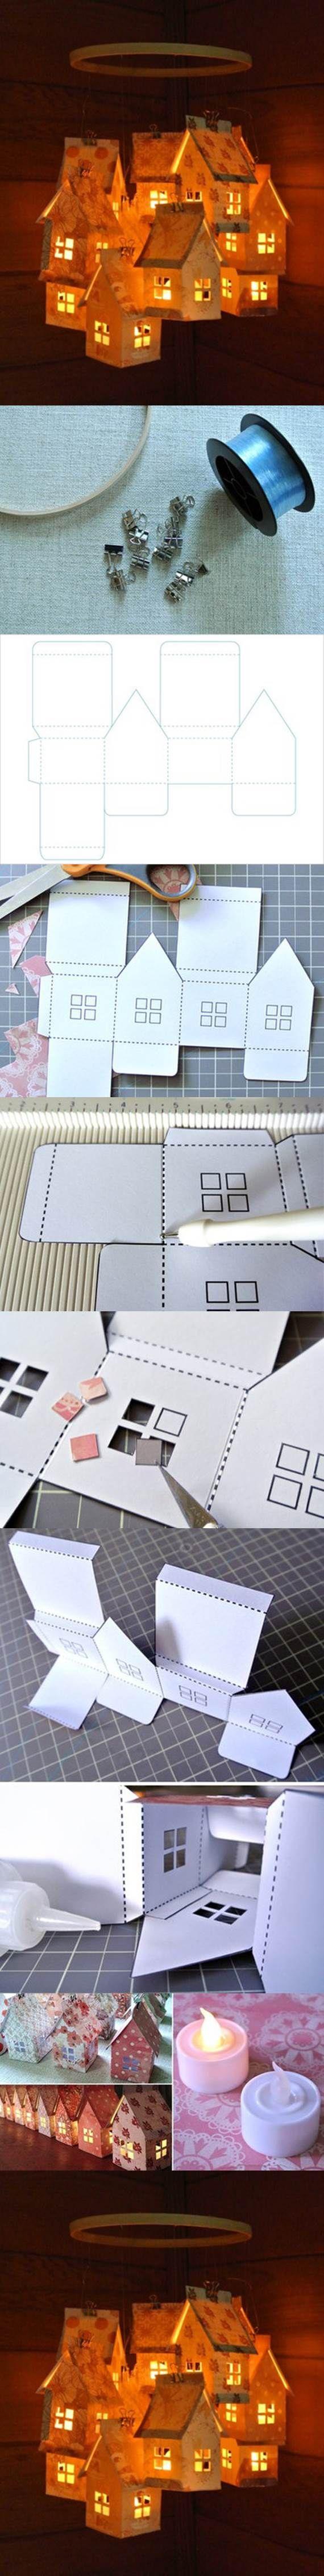 DIY Cardboard Small Village Shaped Lantern | iCreativeIdeas.com Like Us on Facebook ==> https://www.facebook.com/icreativeideas